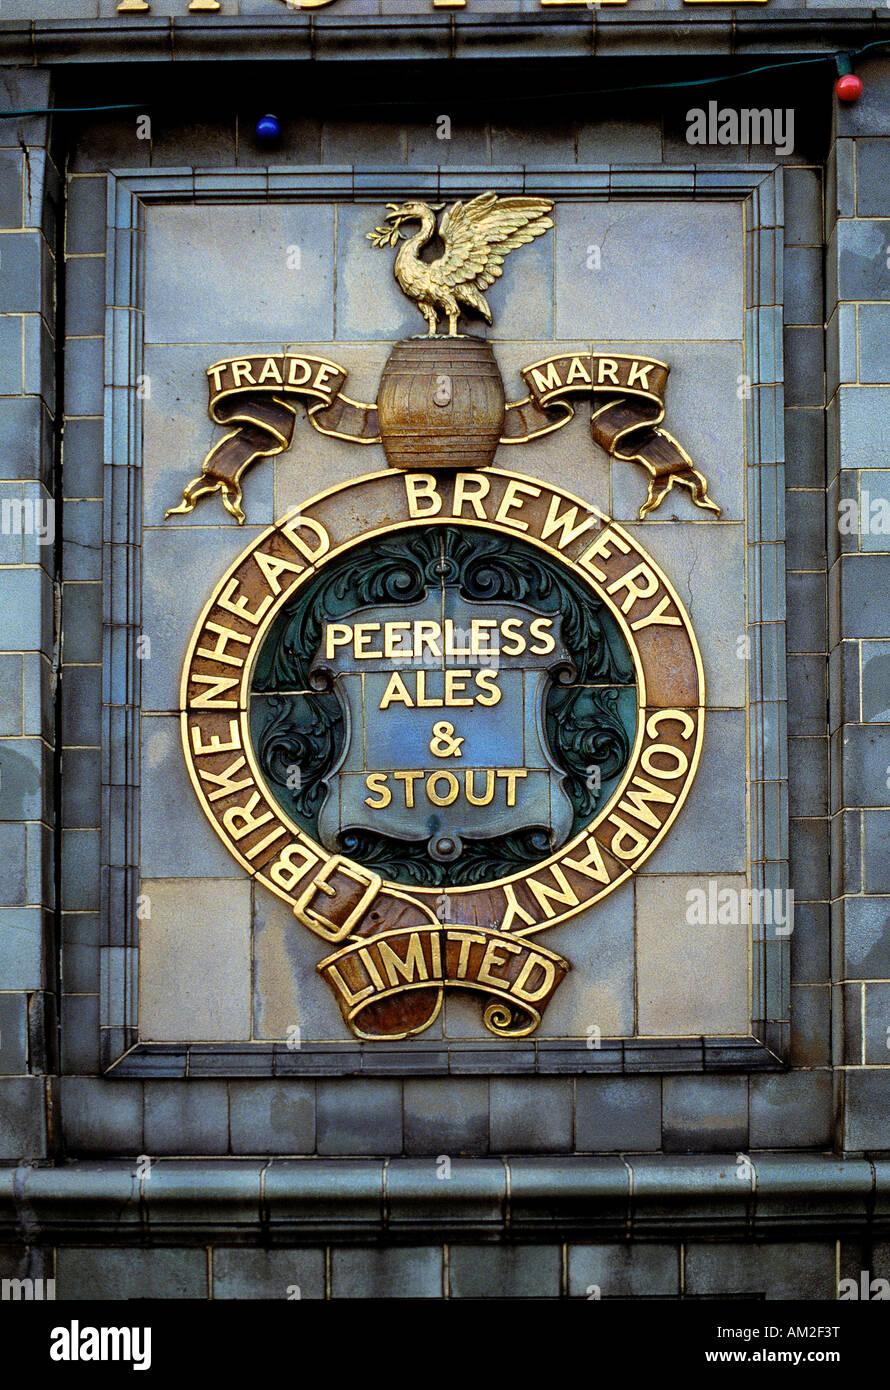 Historic Birkenhead brewery sign, Birkenead, Merseyside, England. - Stock Image